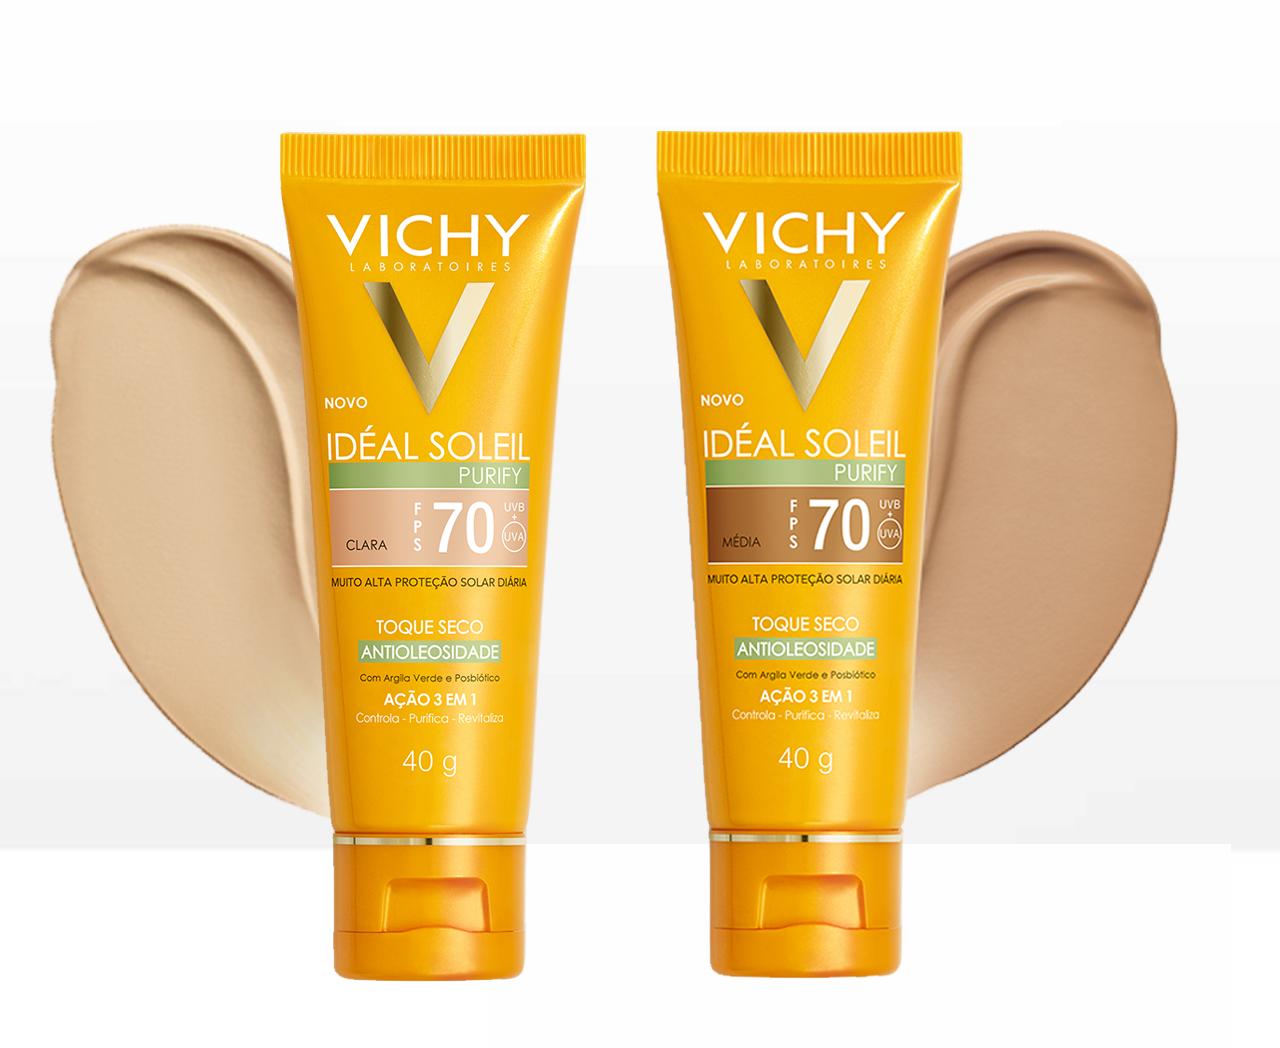 Protetor Solar Facial Com Cor Vichy Ideal Soleil Purify FPS70